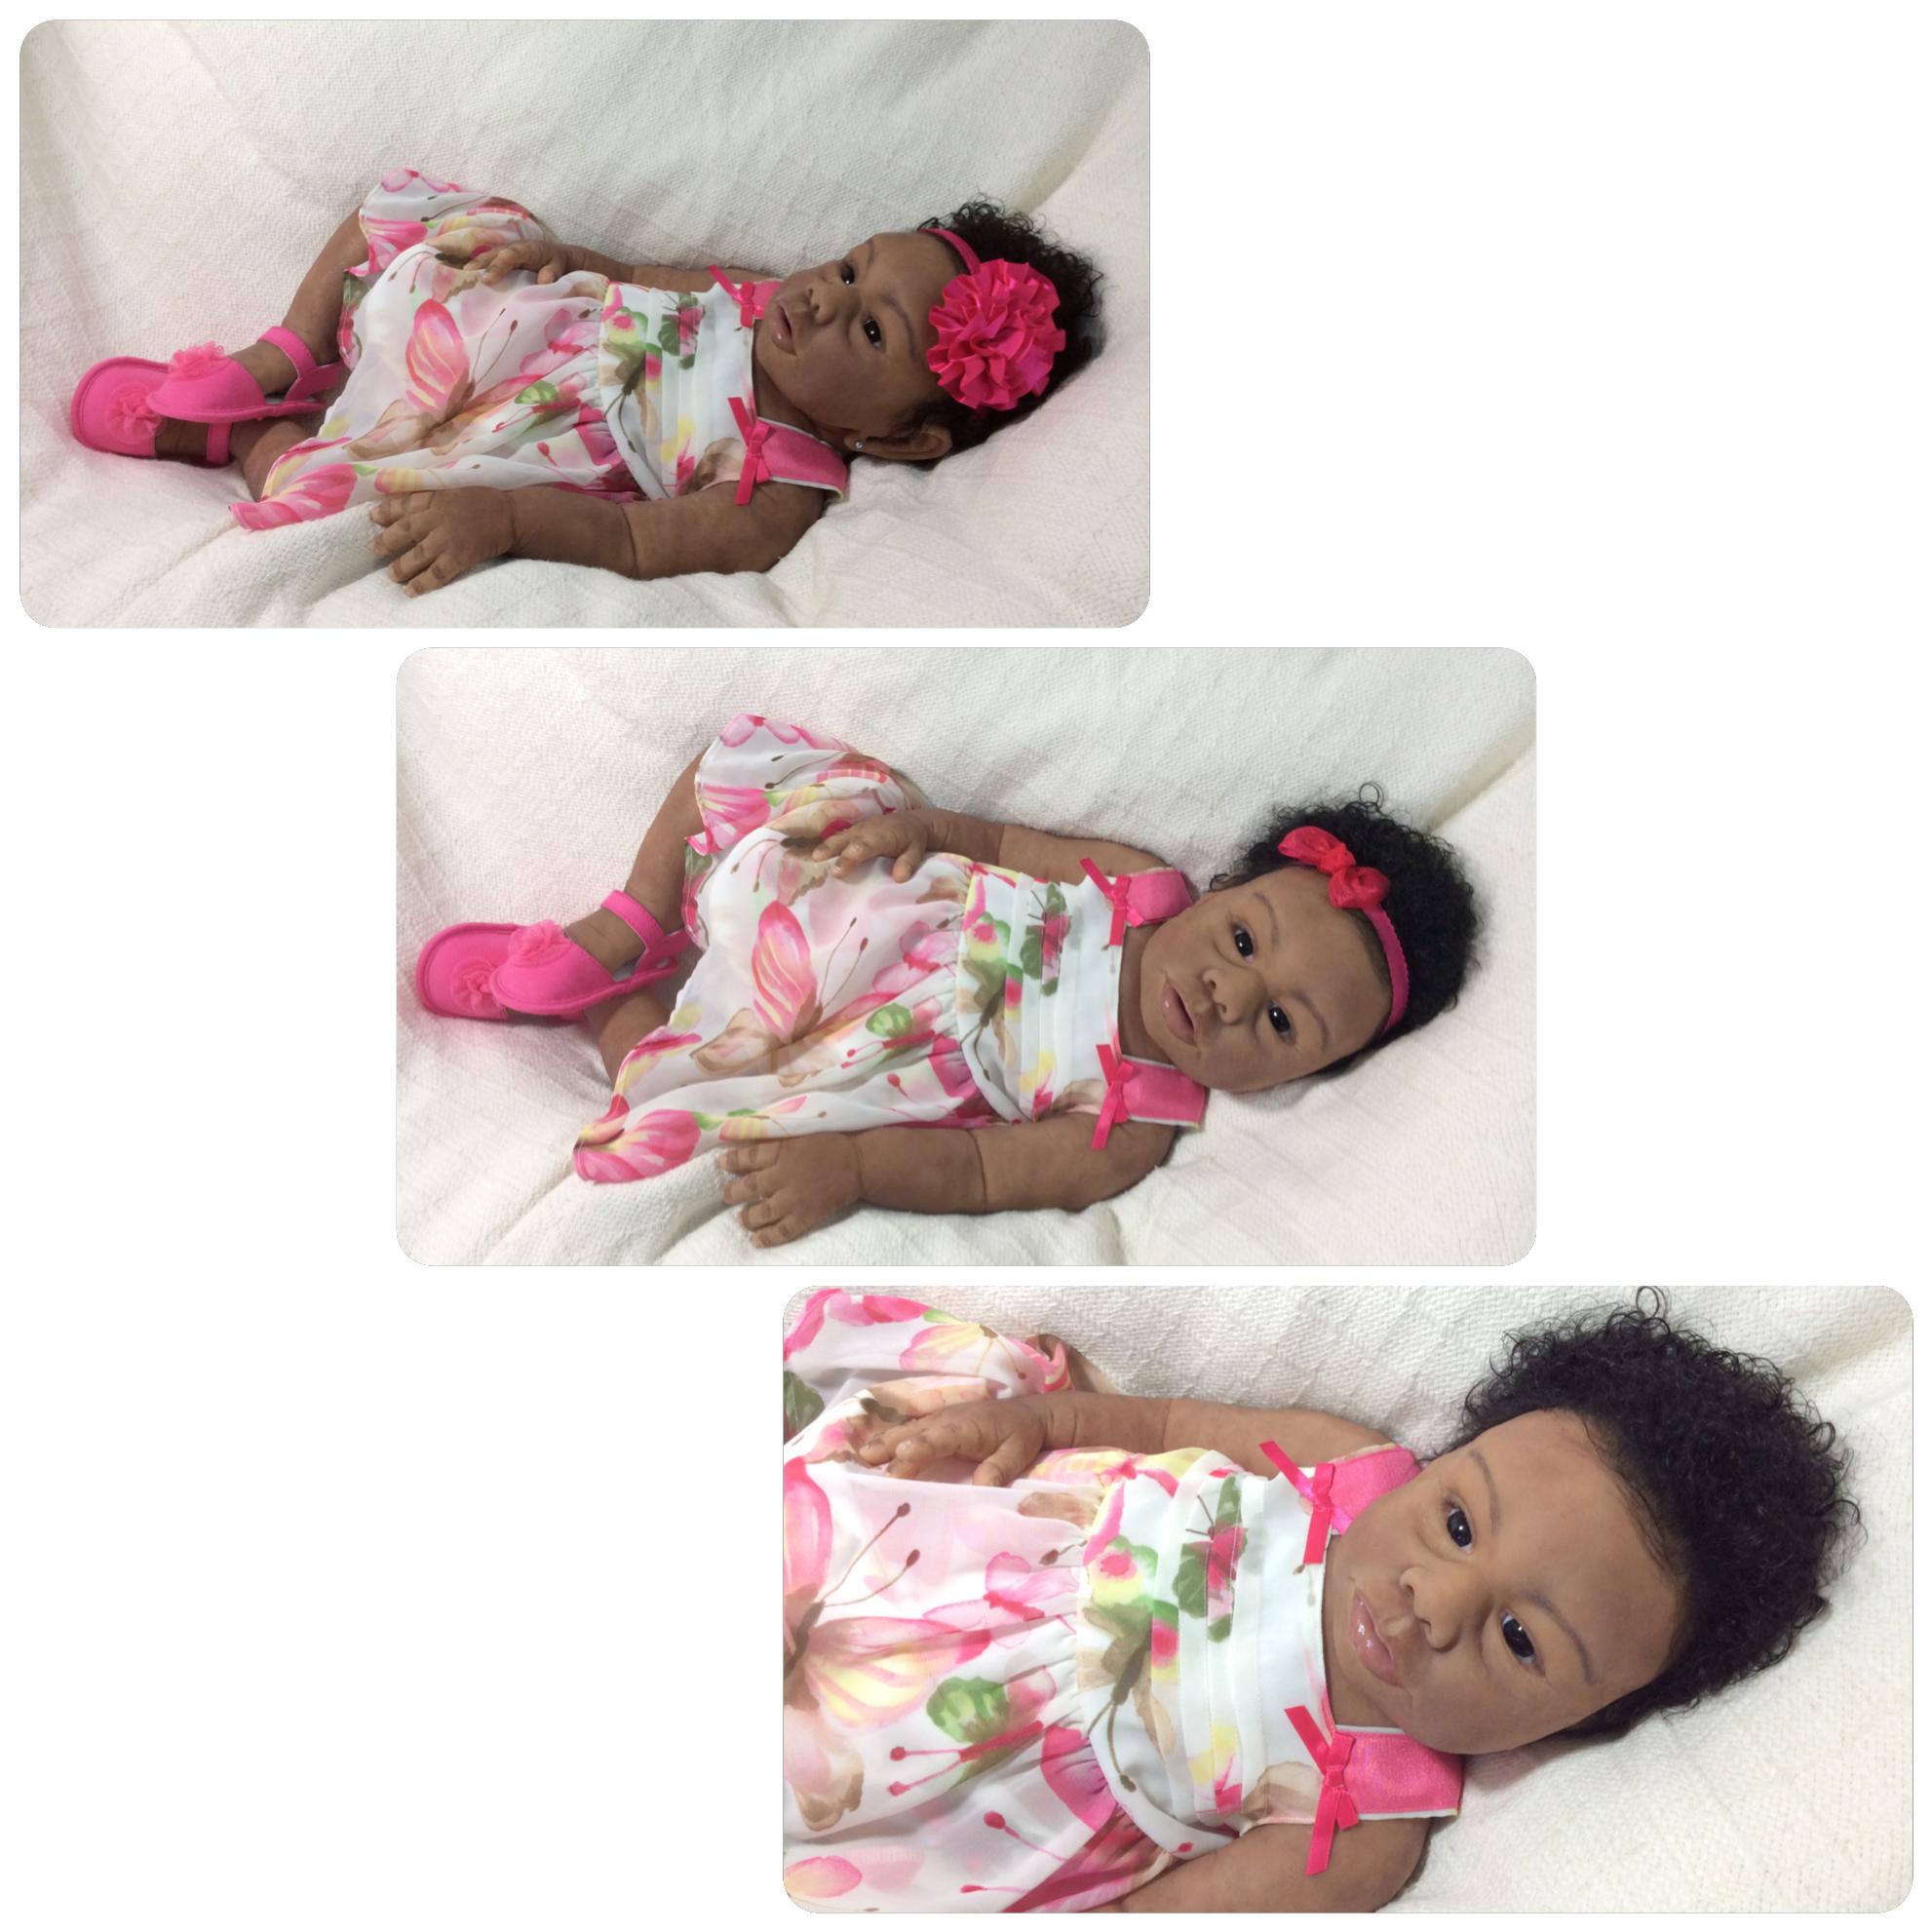 Cotton Babies Nursery - Silicone Babies